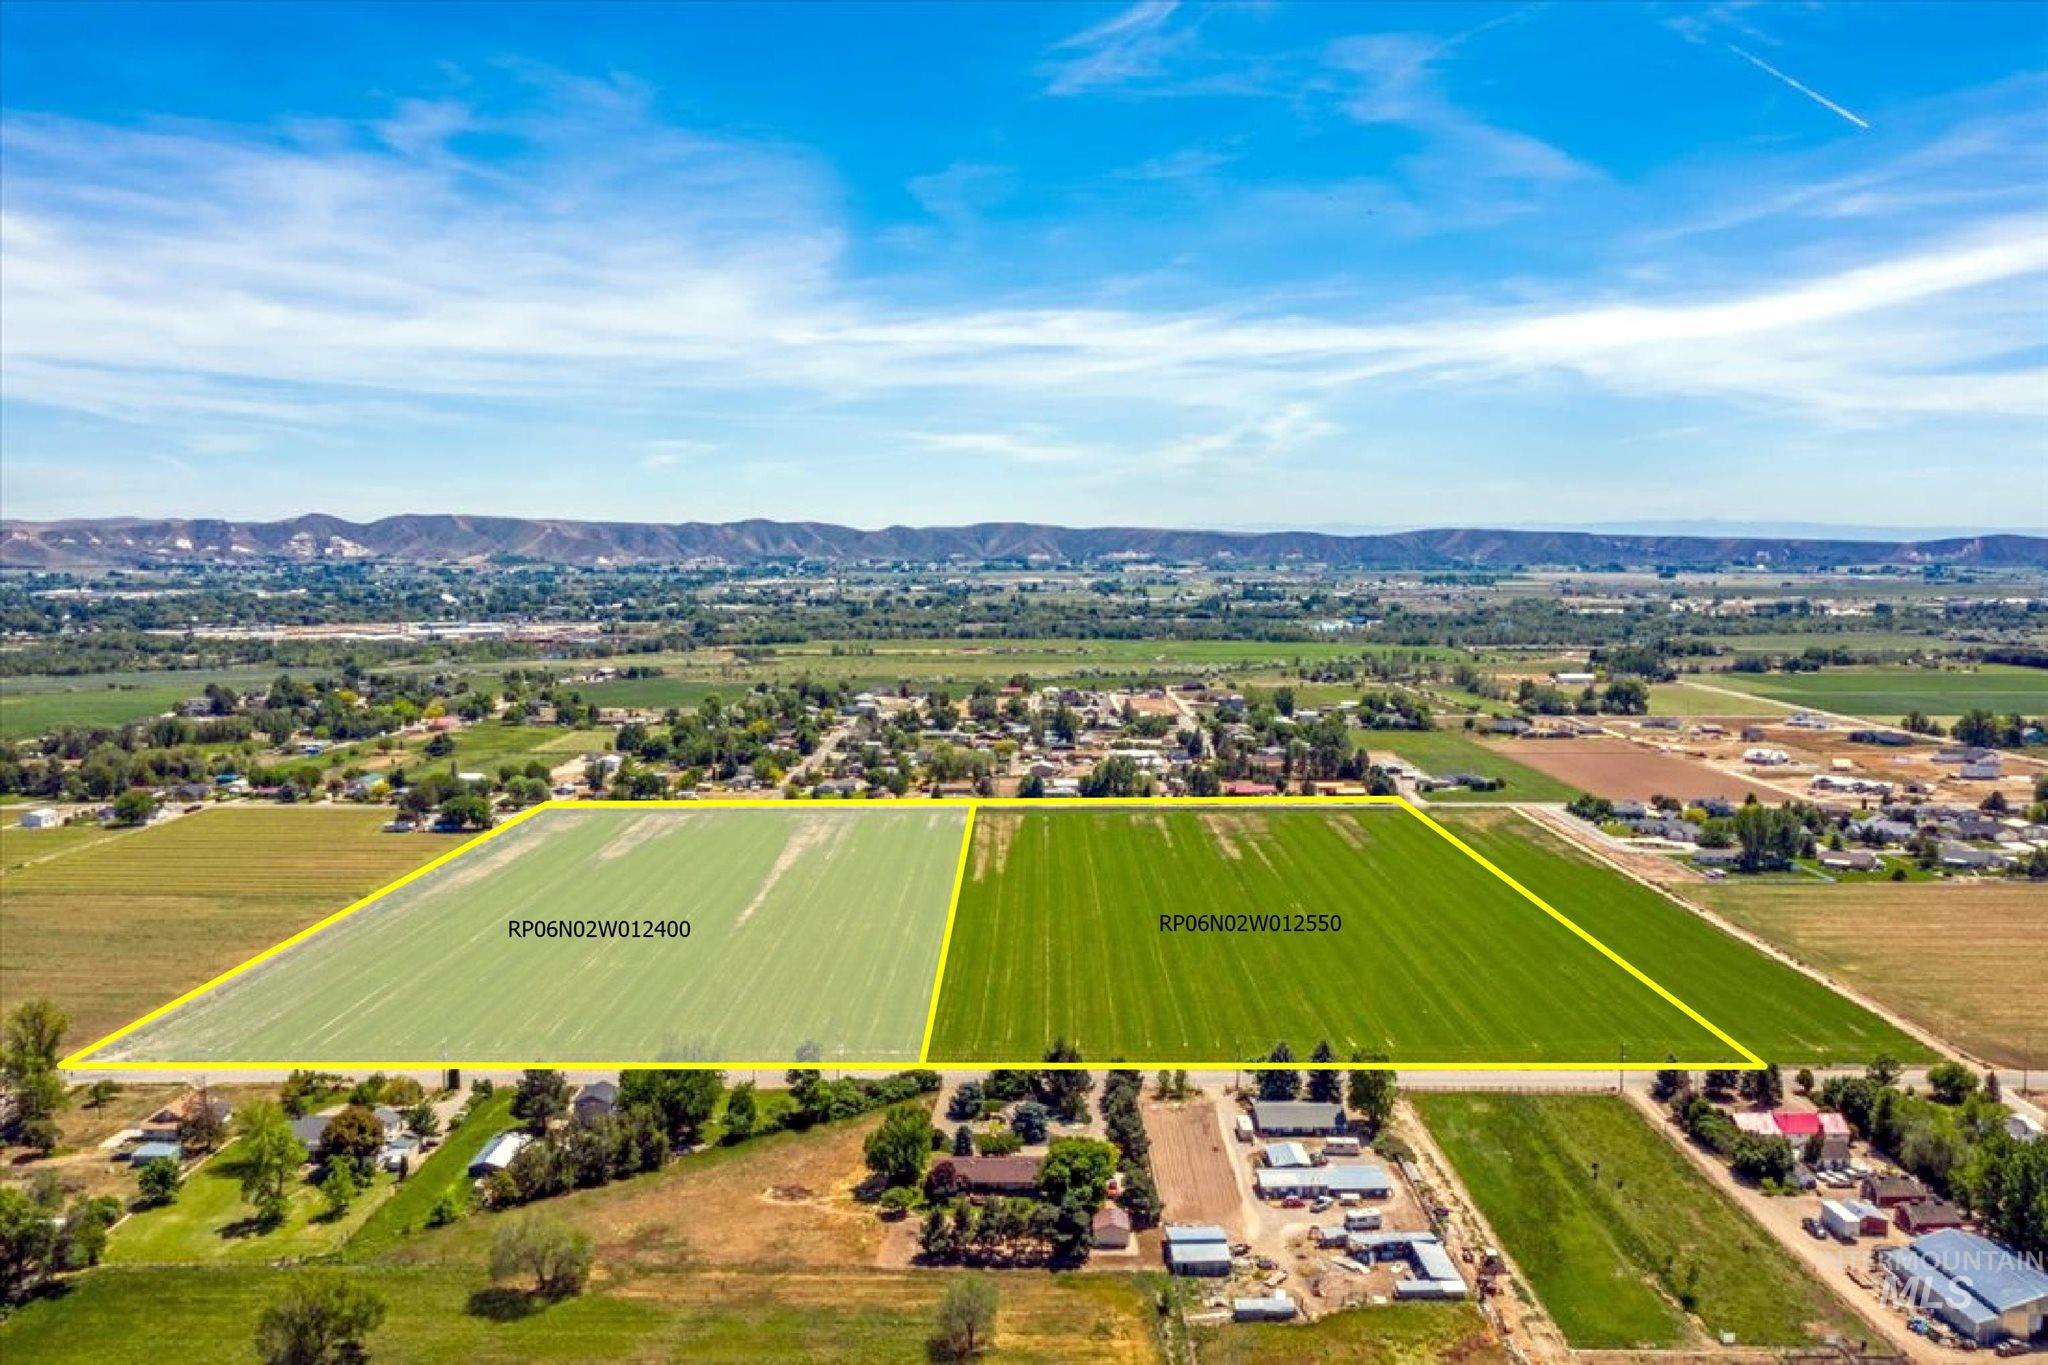 Tbd W Idaho Blvd Property Photo